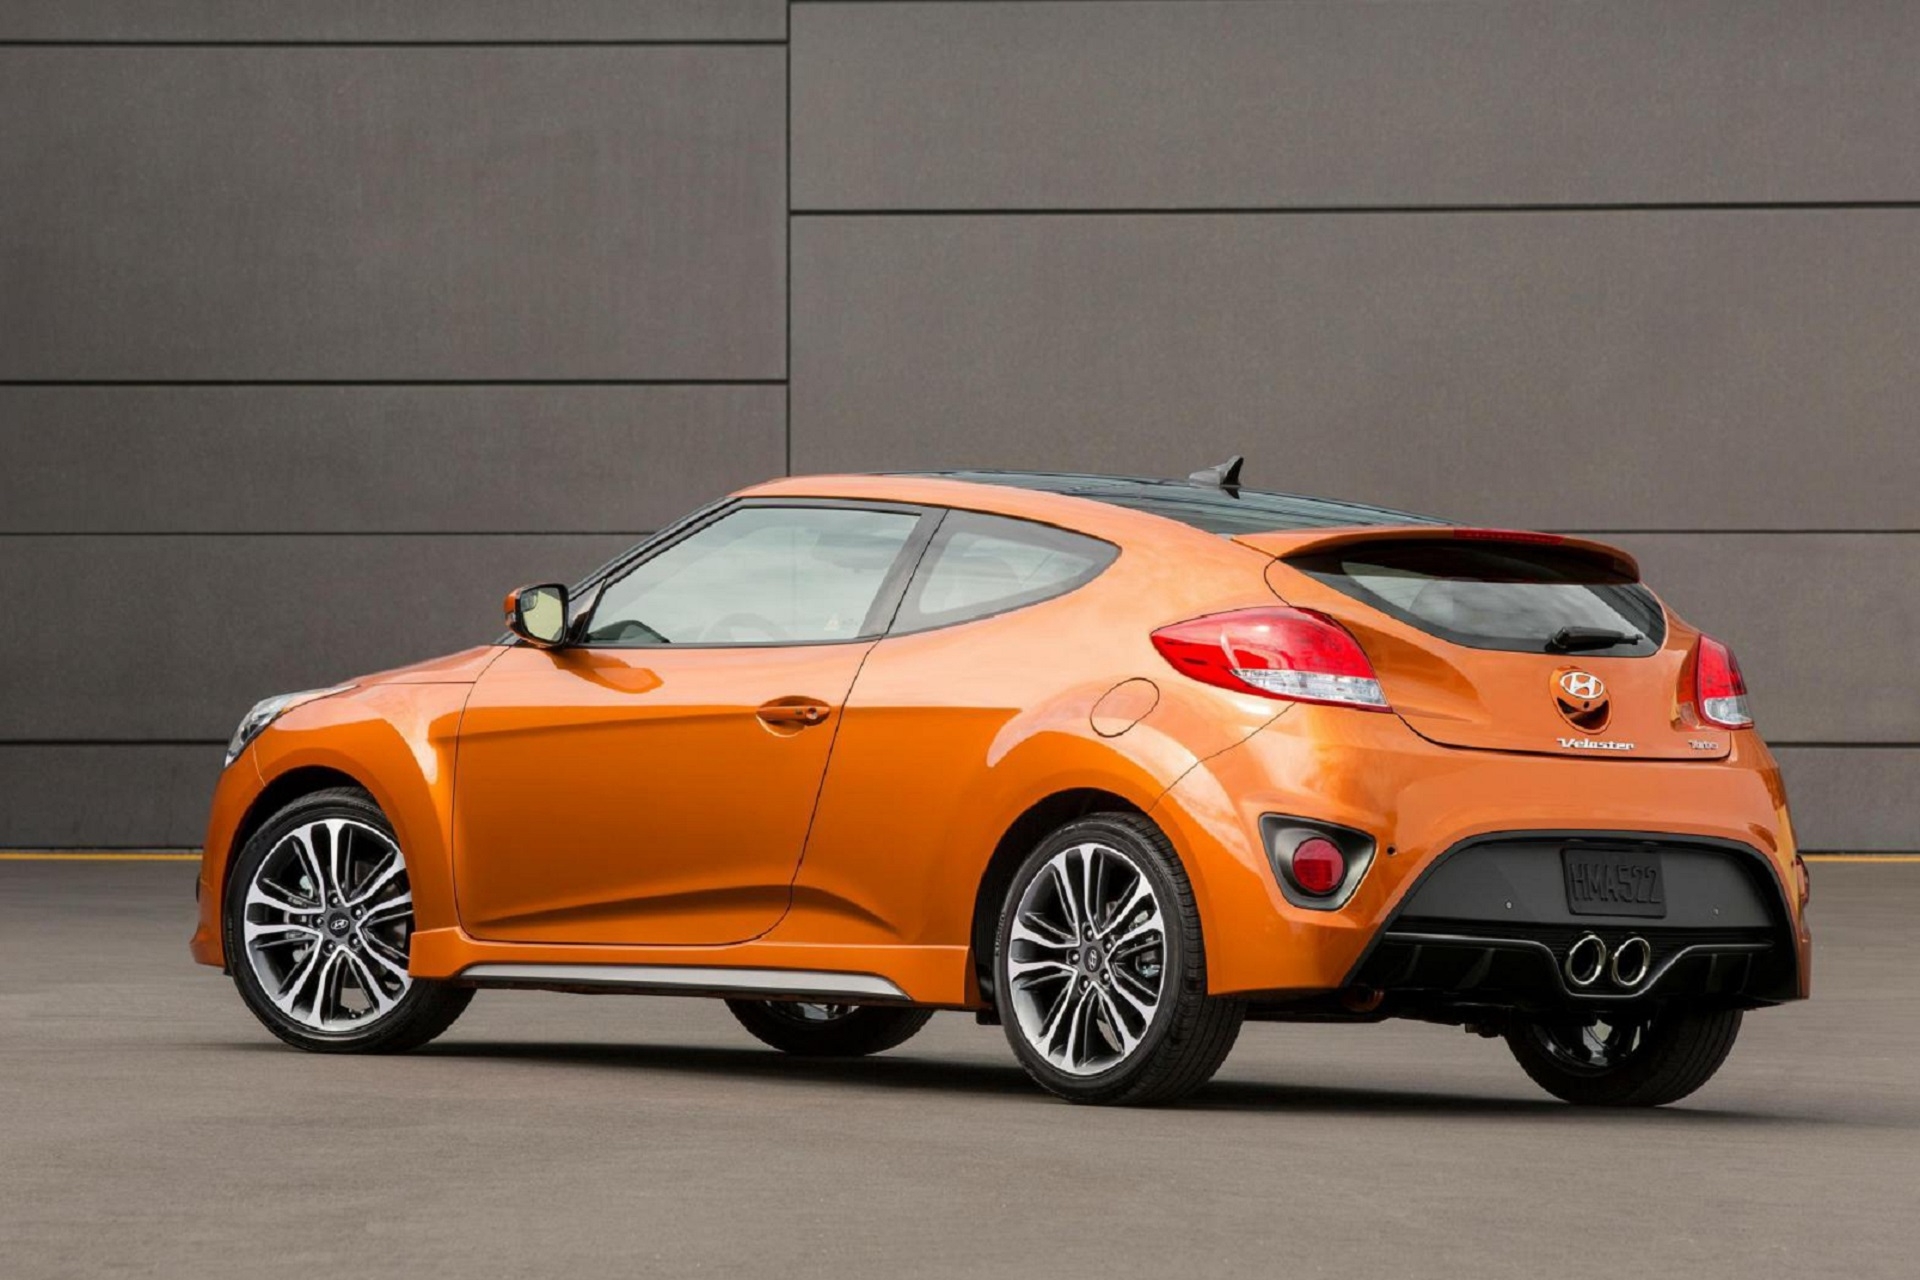 Hyundai High Definition